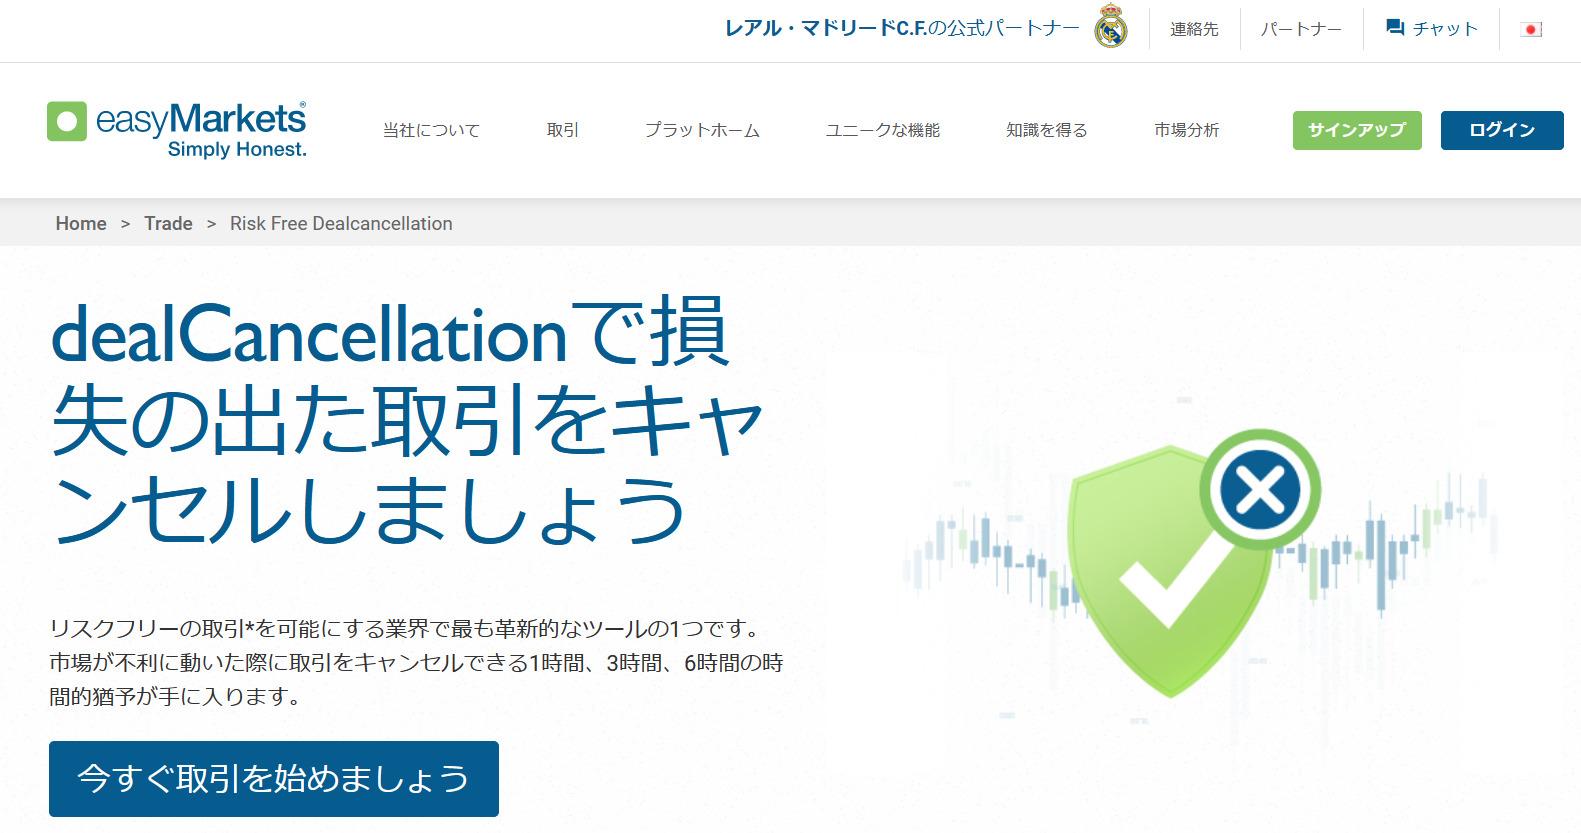 easy Markets メリット・デメリット_dealCancellation